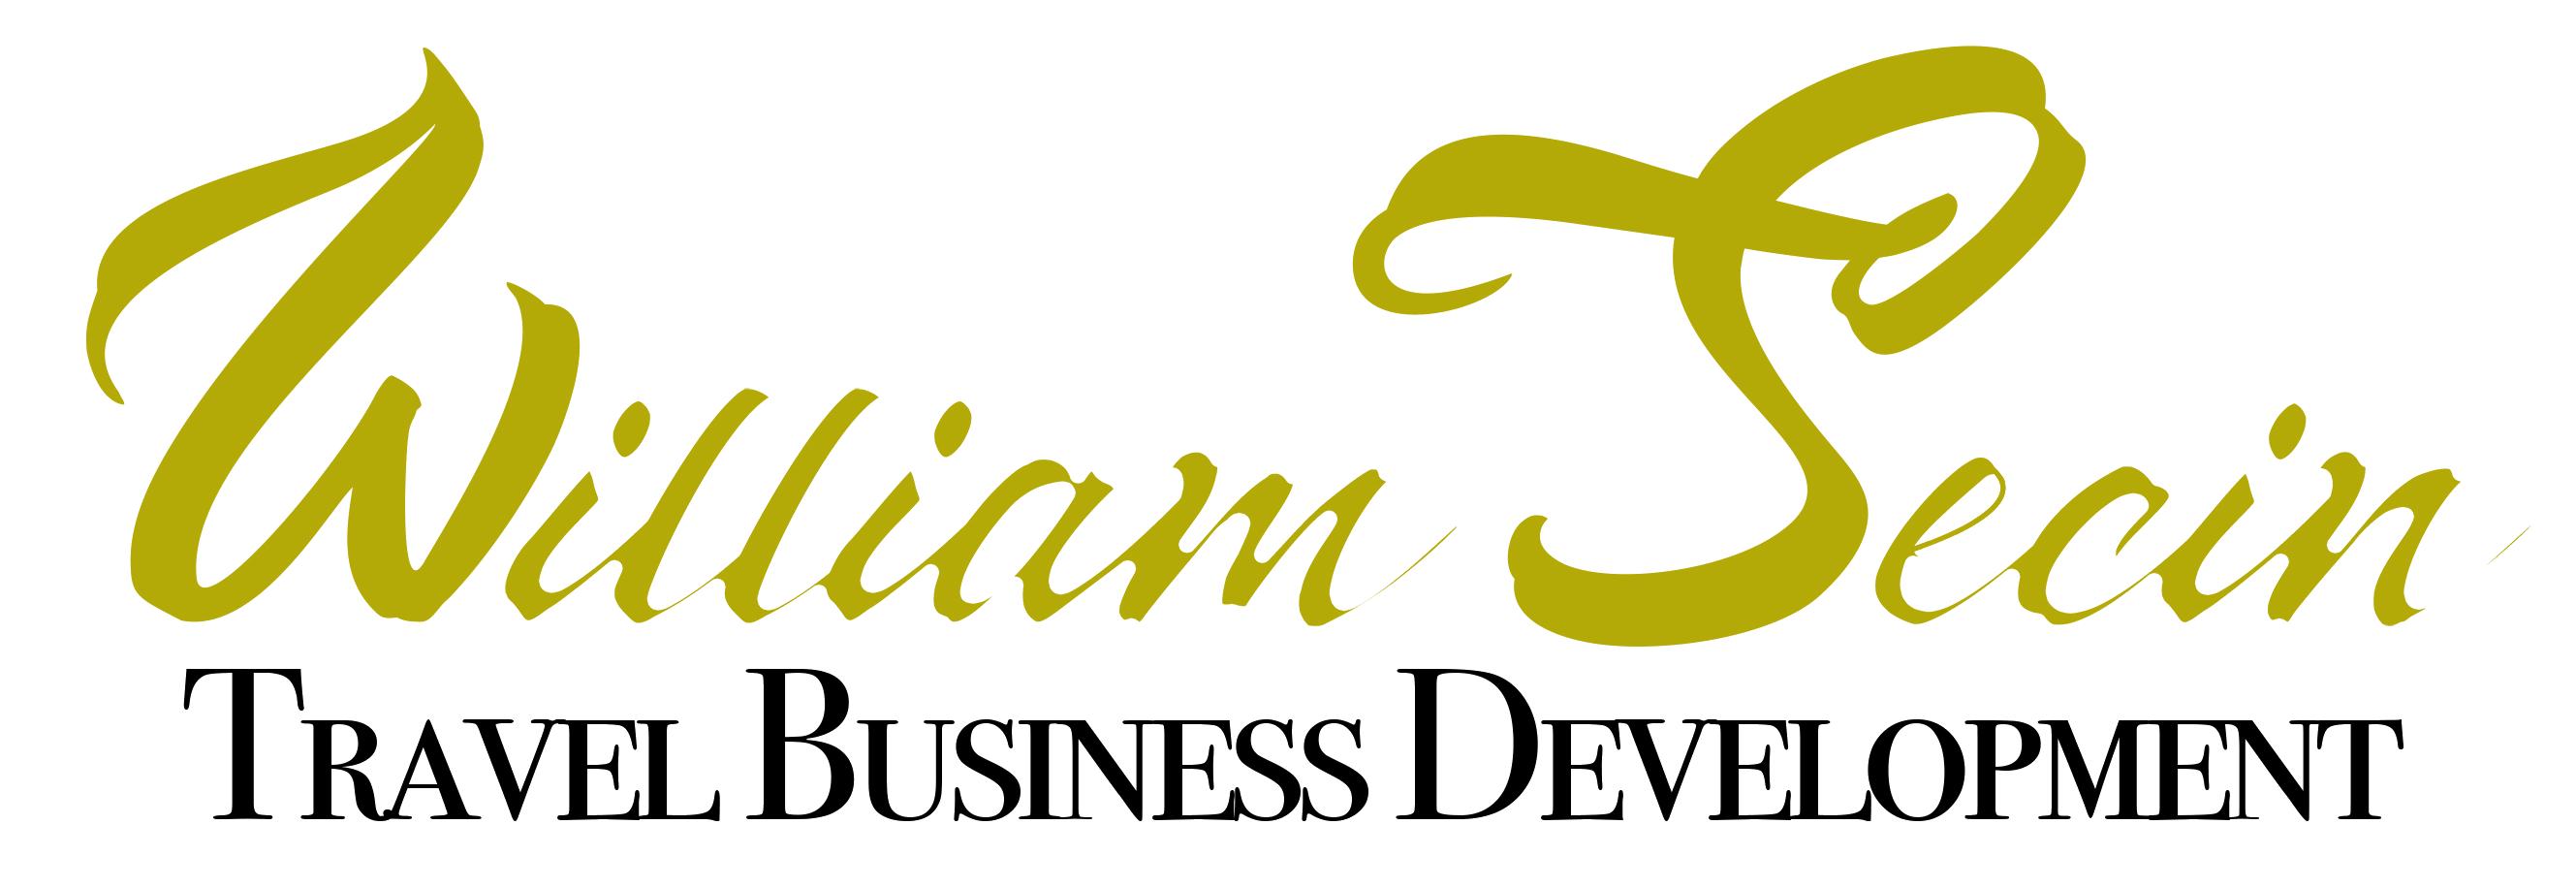 WS - Corporate Venture Builder